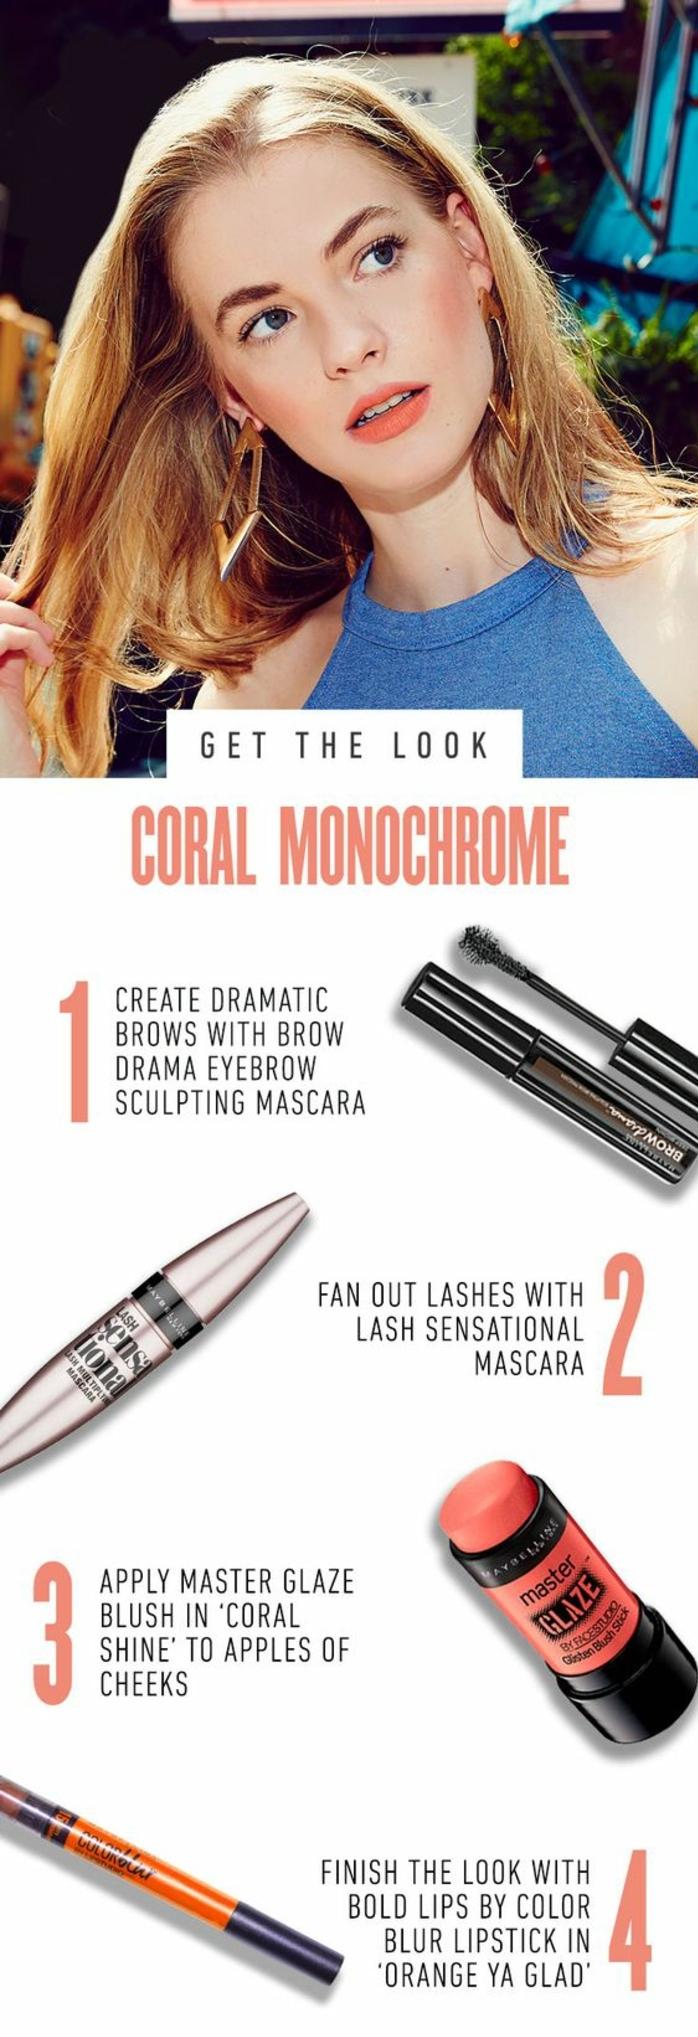 maquillage léger effet corail monochrome, tuto maquillage par Maybelline